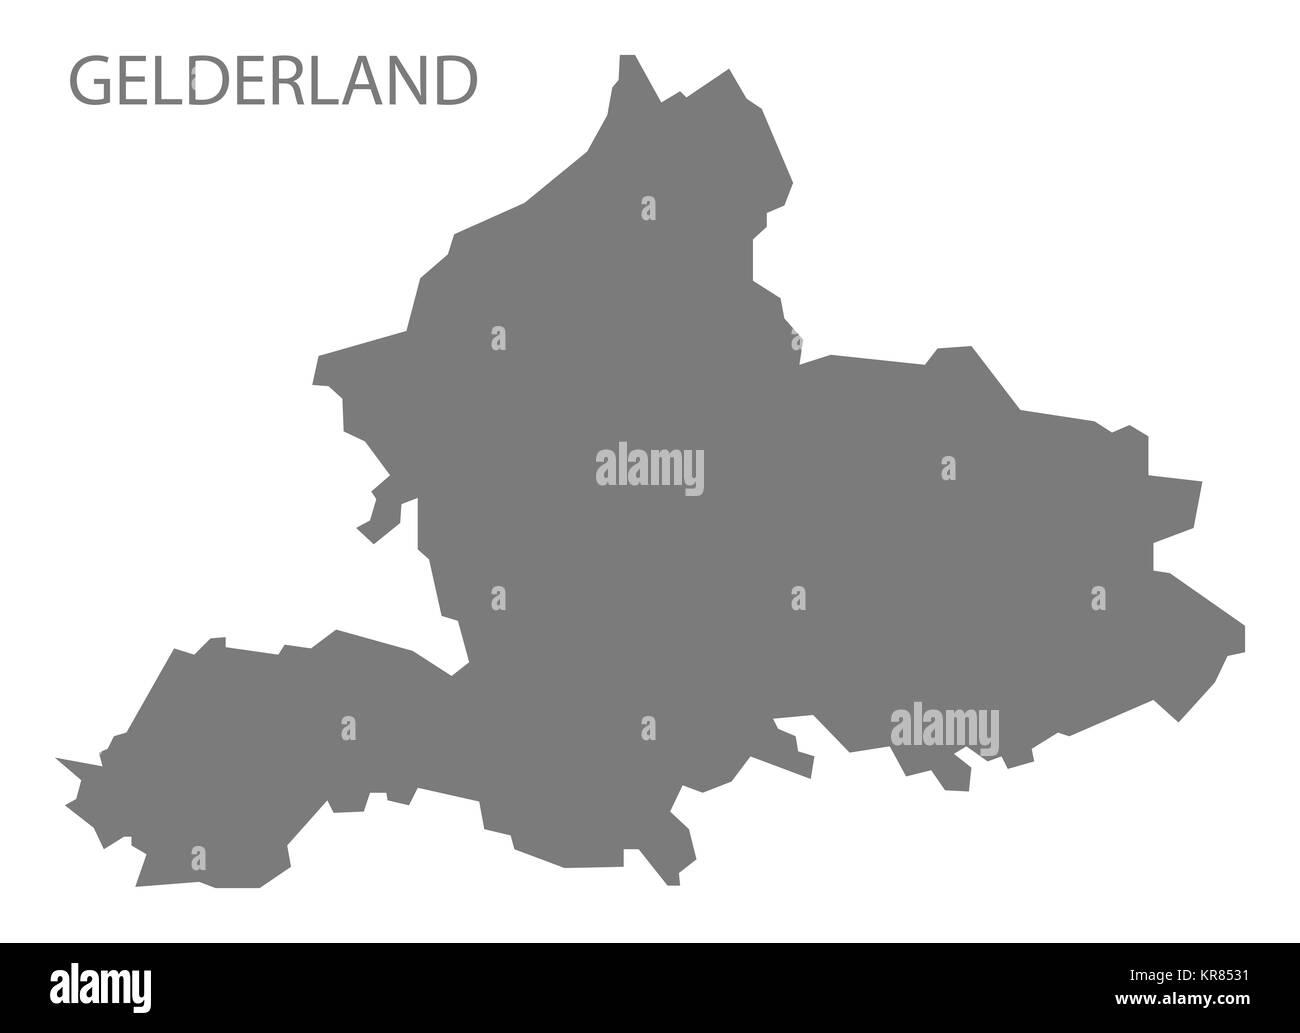 Gelderland Netherlands Map grey Stock Photo 169210021 Alamy